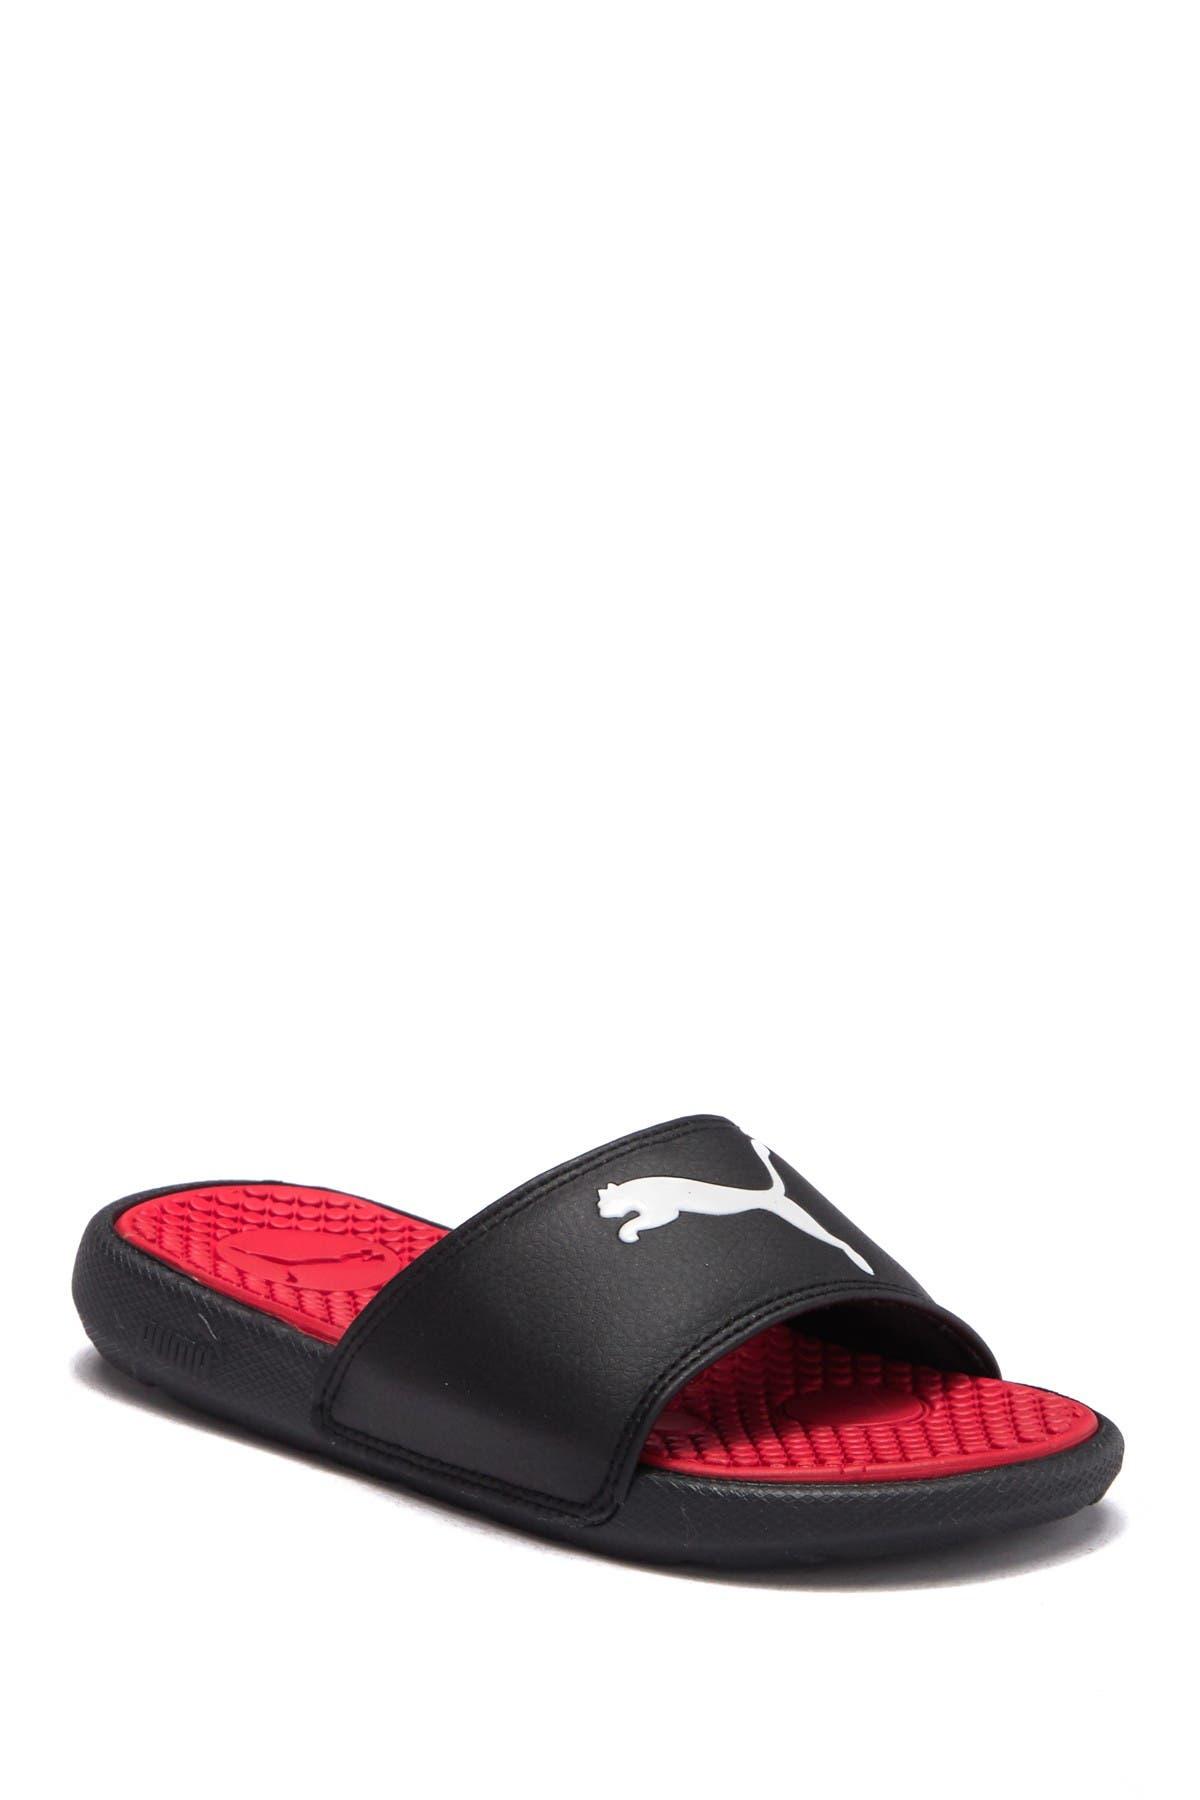 Image of PUMA Cool Cat Sport Jr Slide Sandal